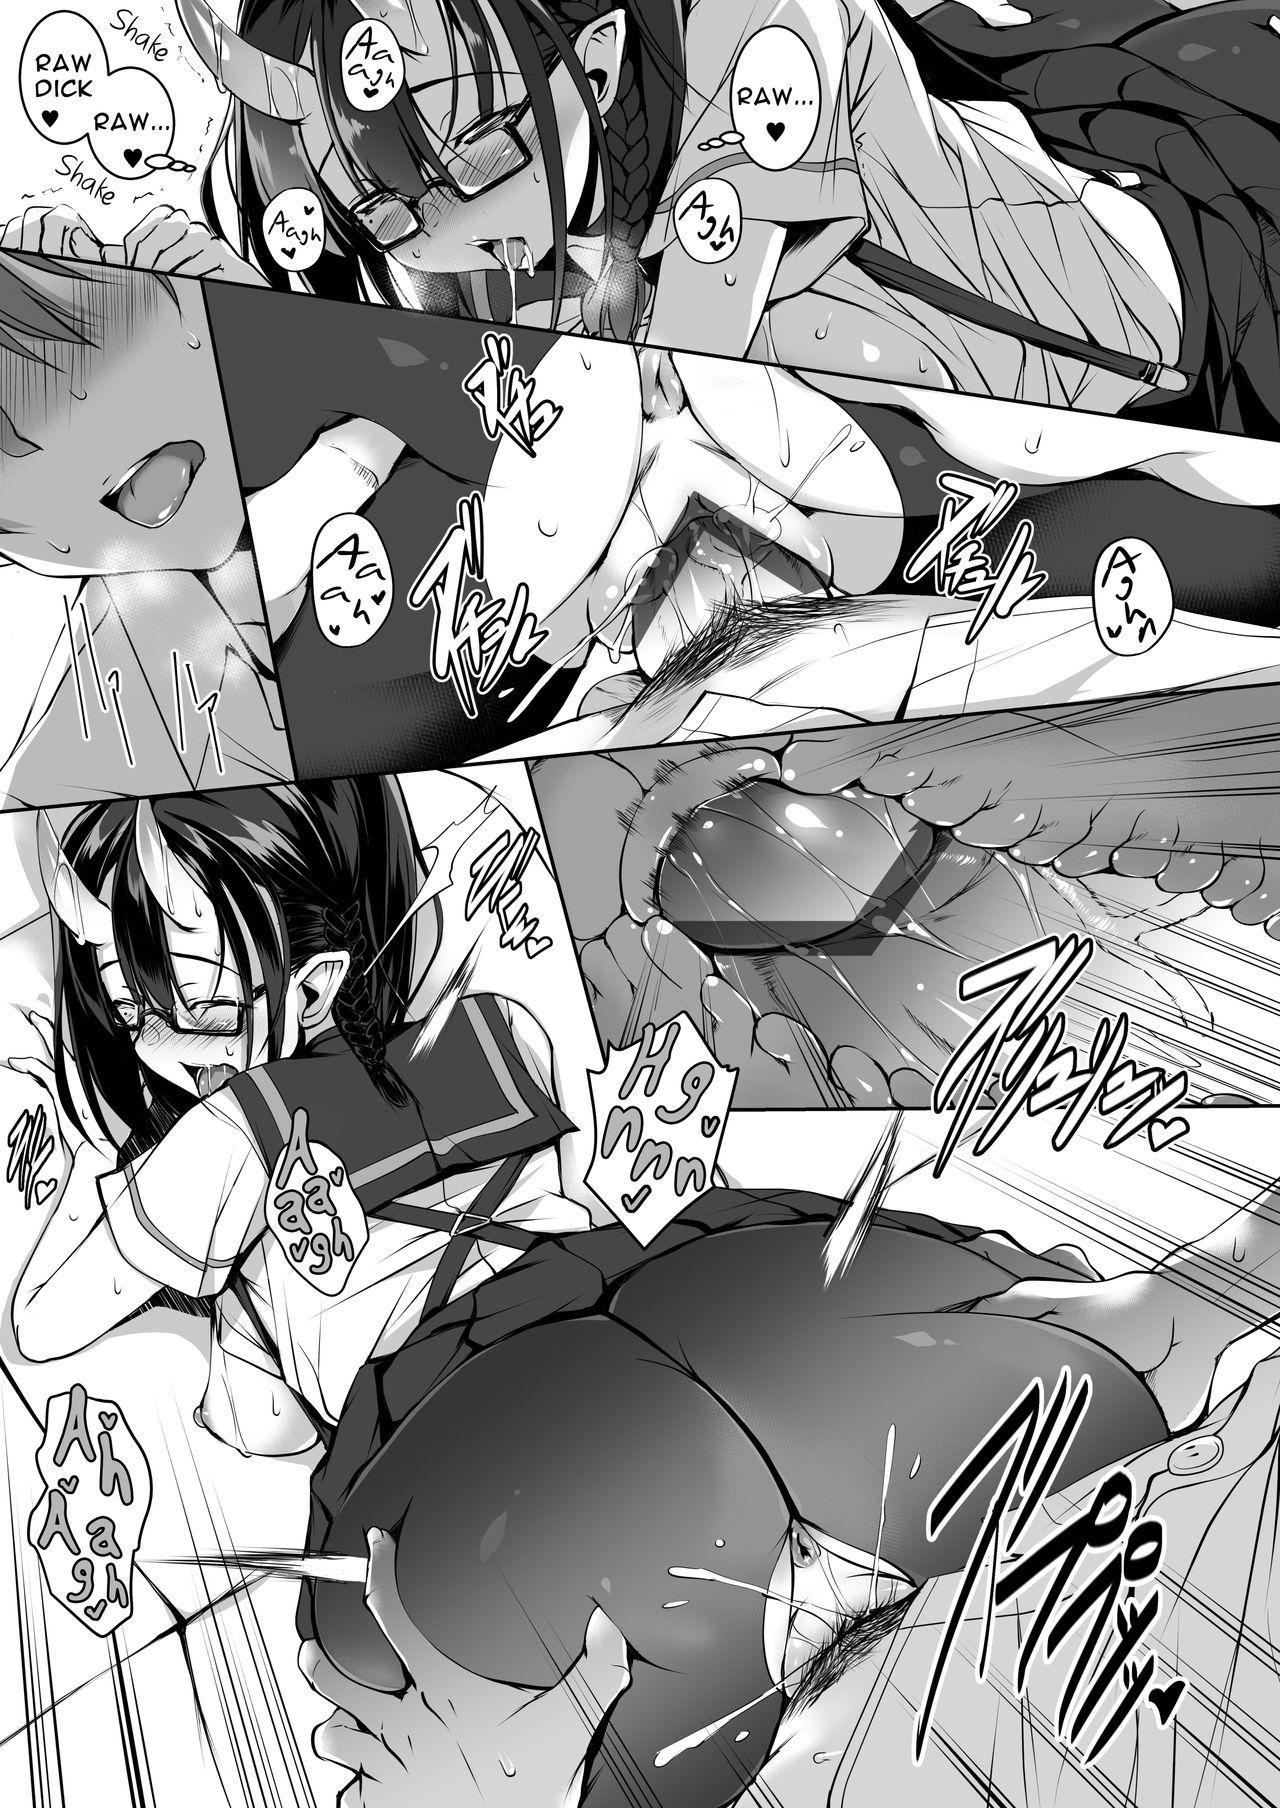 Ikenai Ko demo, Suki de Ite Kuremasu ka?   Do you really like such a naughty girl like me? 18